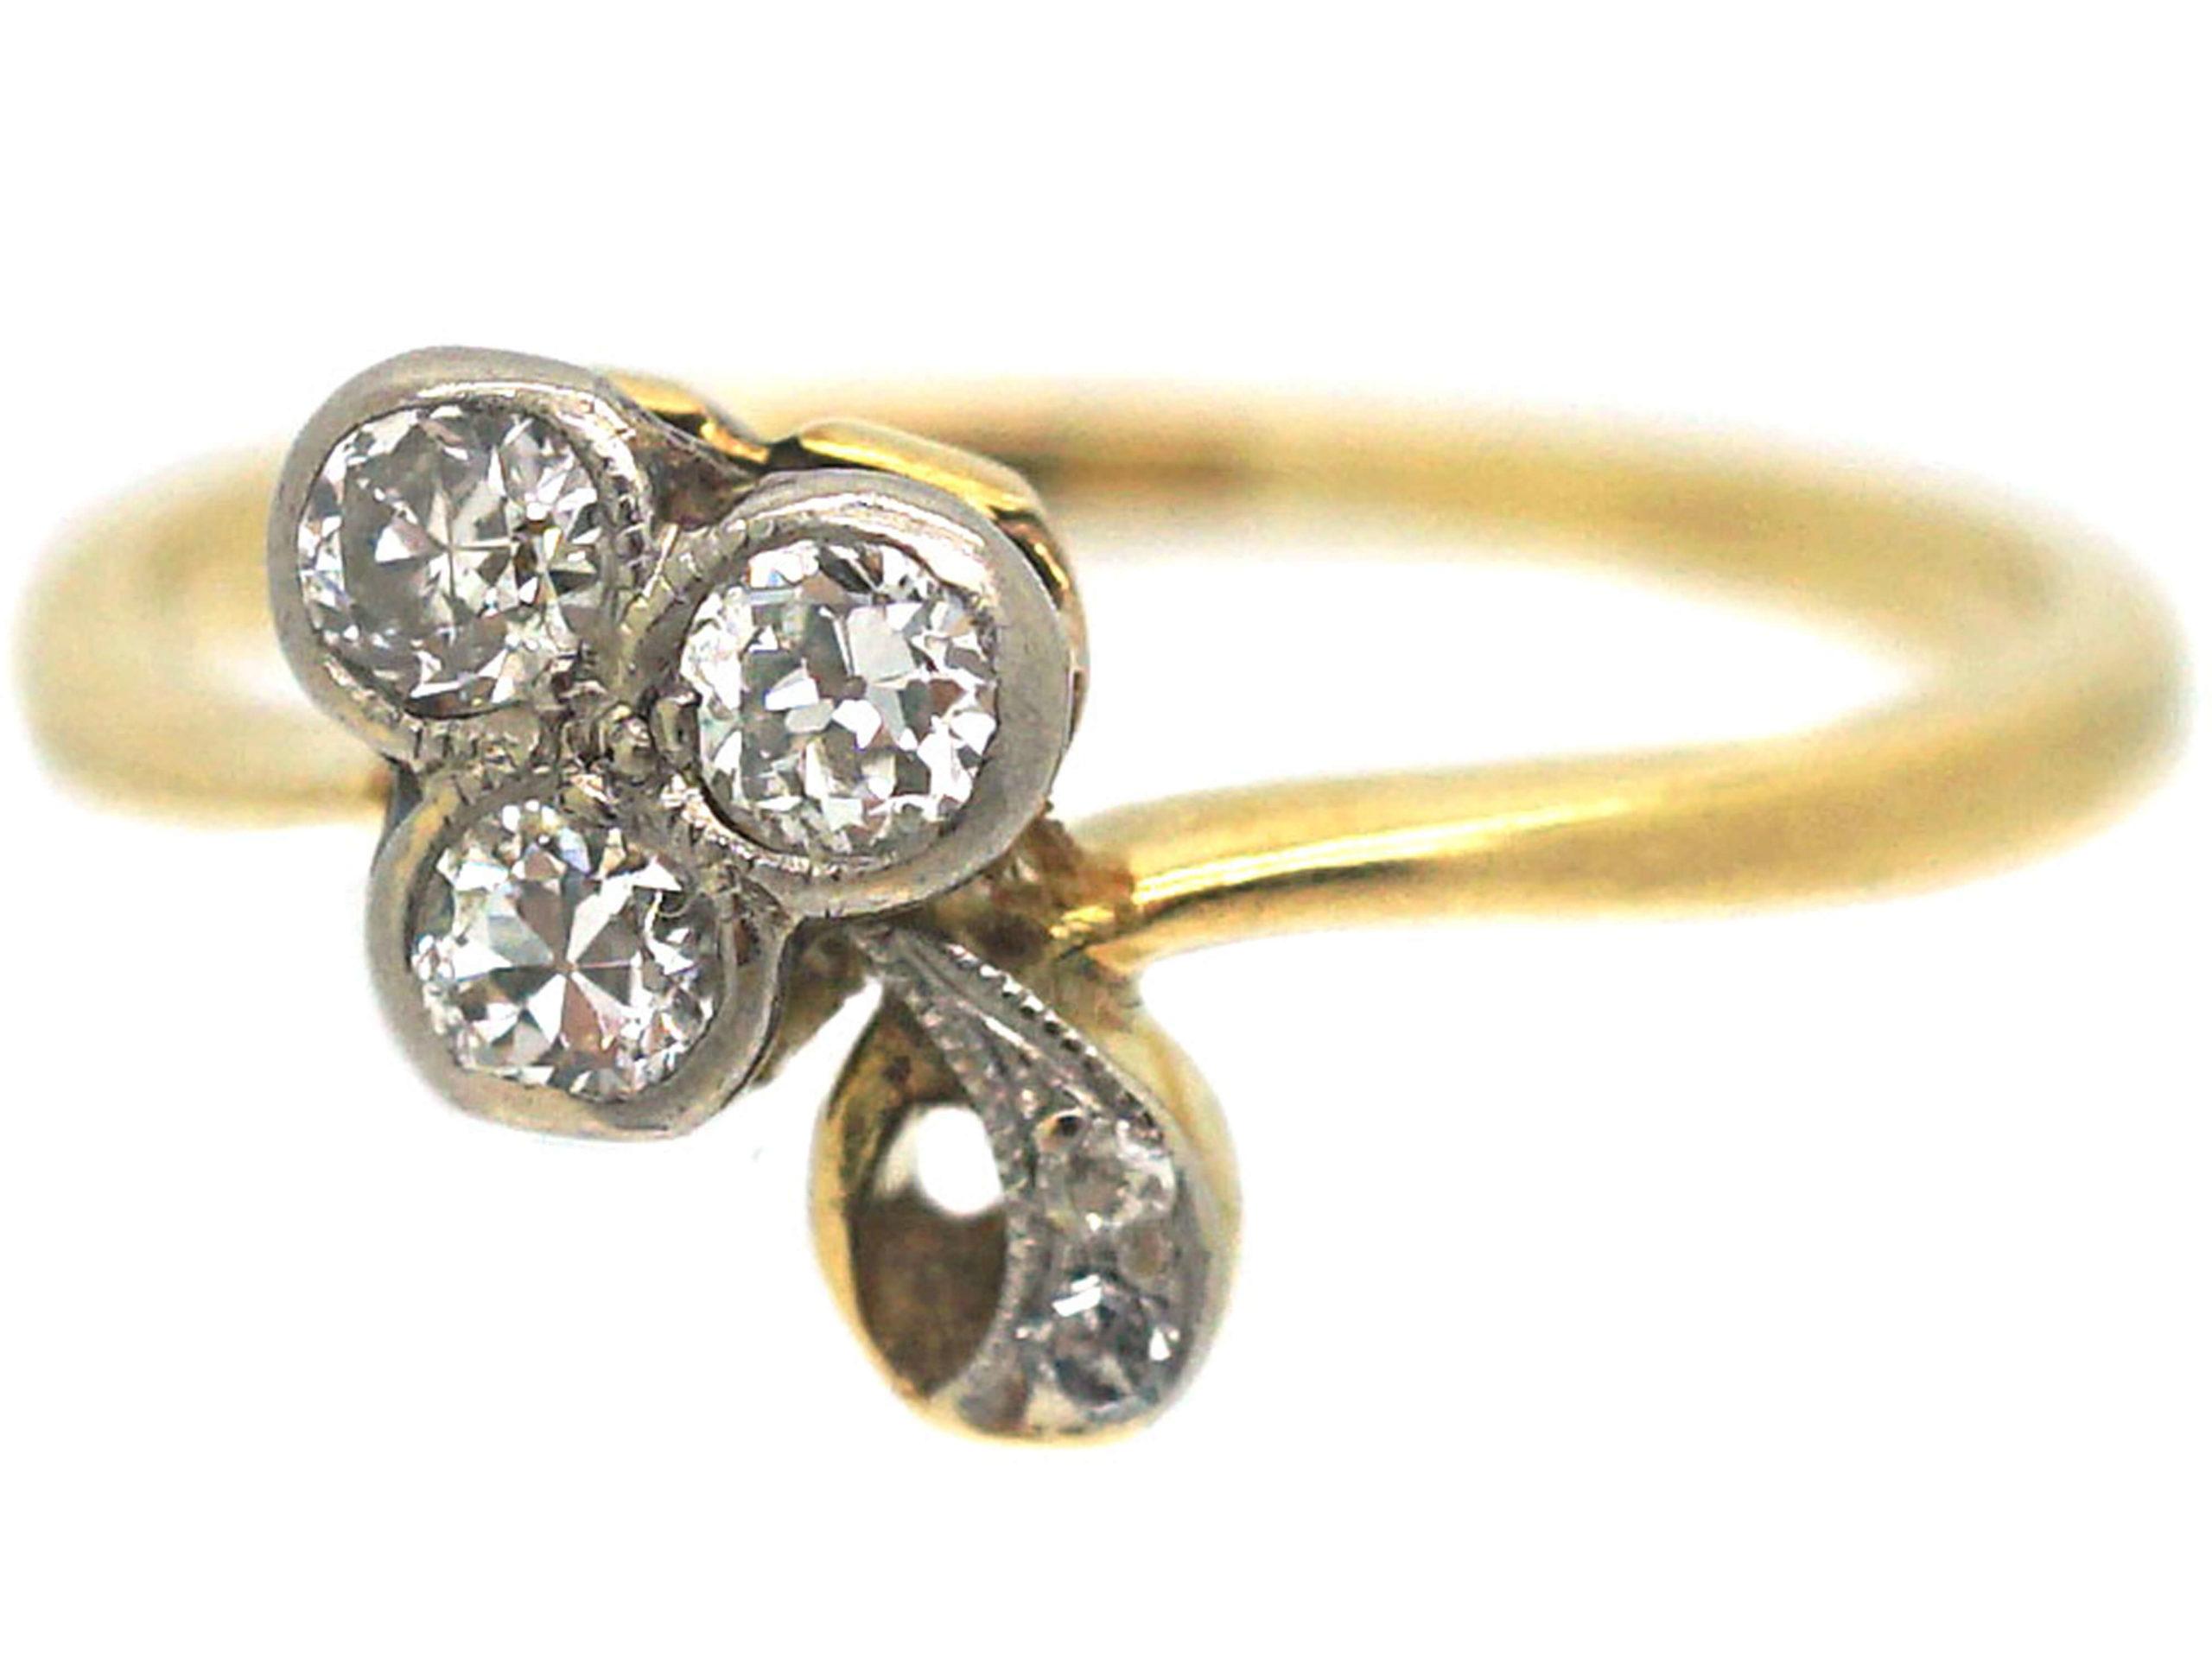 Edwardian 18ct Gold & Platinum Three Leaf Clover Ring set with Diamonds